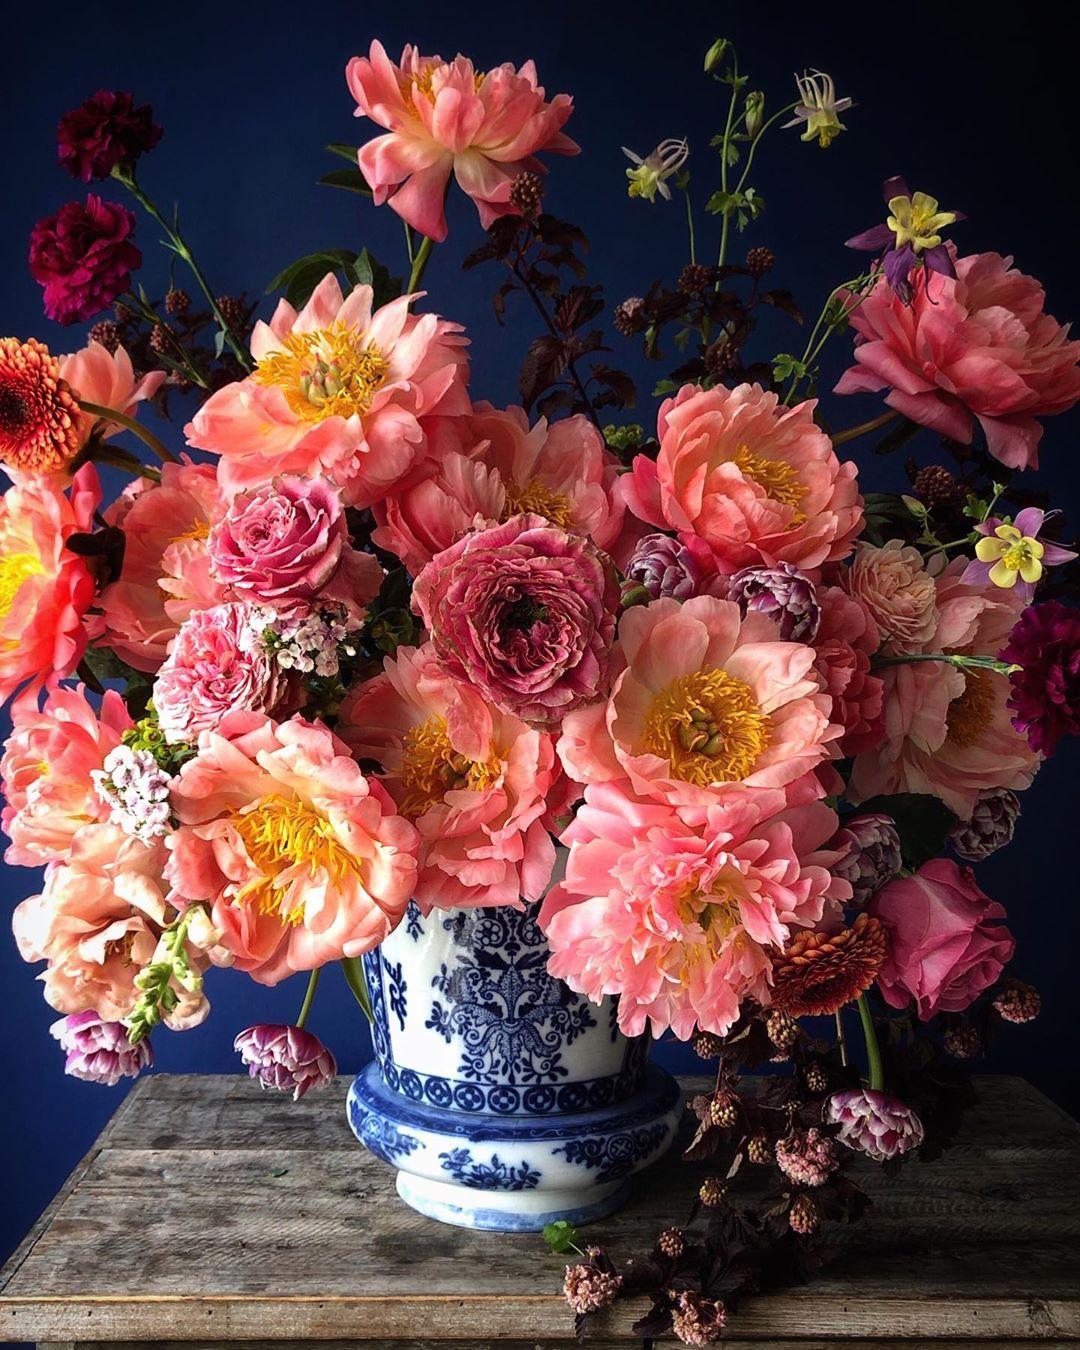 2 628 Likes 45 Comments Natasja Sadi Cakeatelieramsterdam On Instagram Happy S Beautiful Flower Arrangements Fake Flower Arrangements Beautiful Flowers